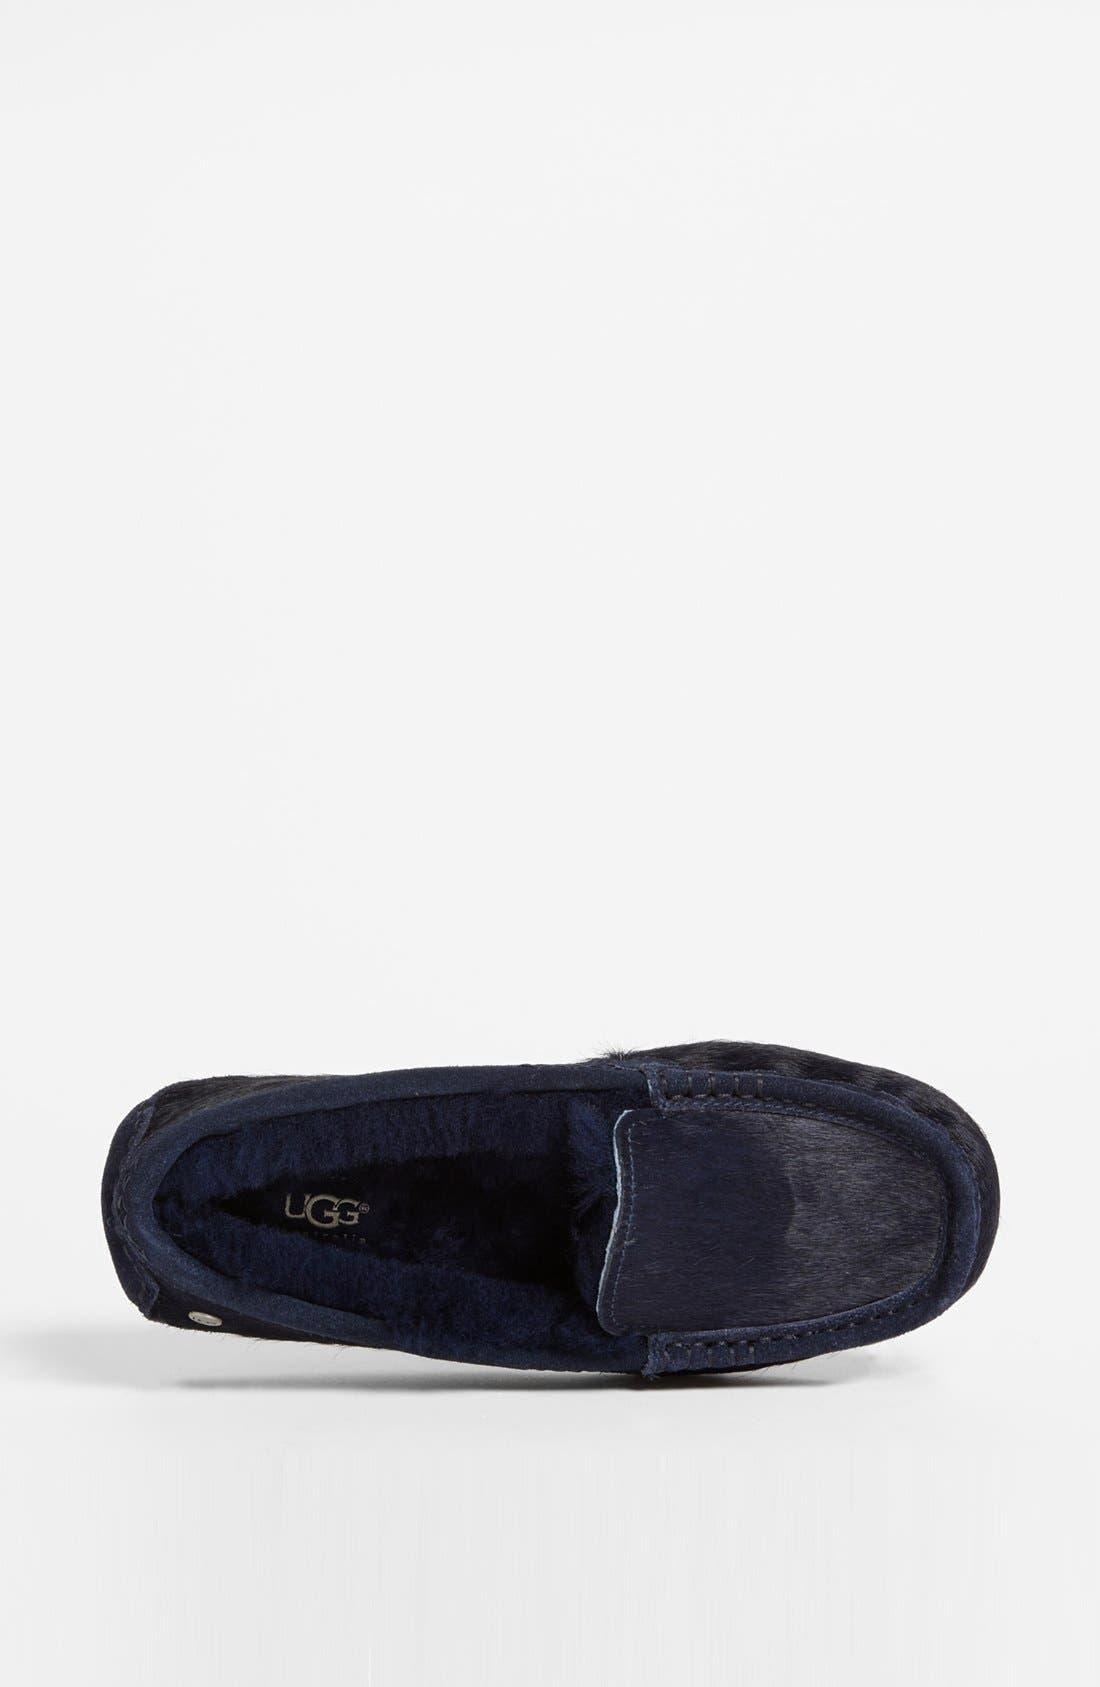 Alternate Image 3  - UGG® Australia 'Ansley Exotic' Slipper (Women) (Exclusive Color)